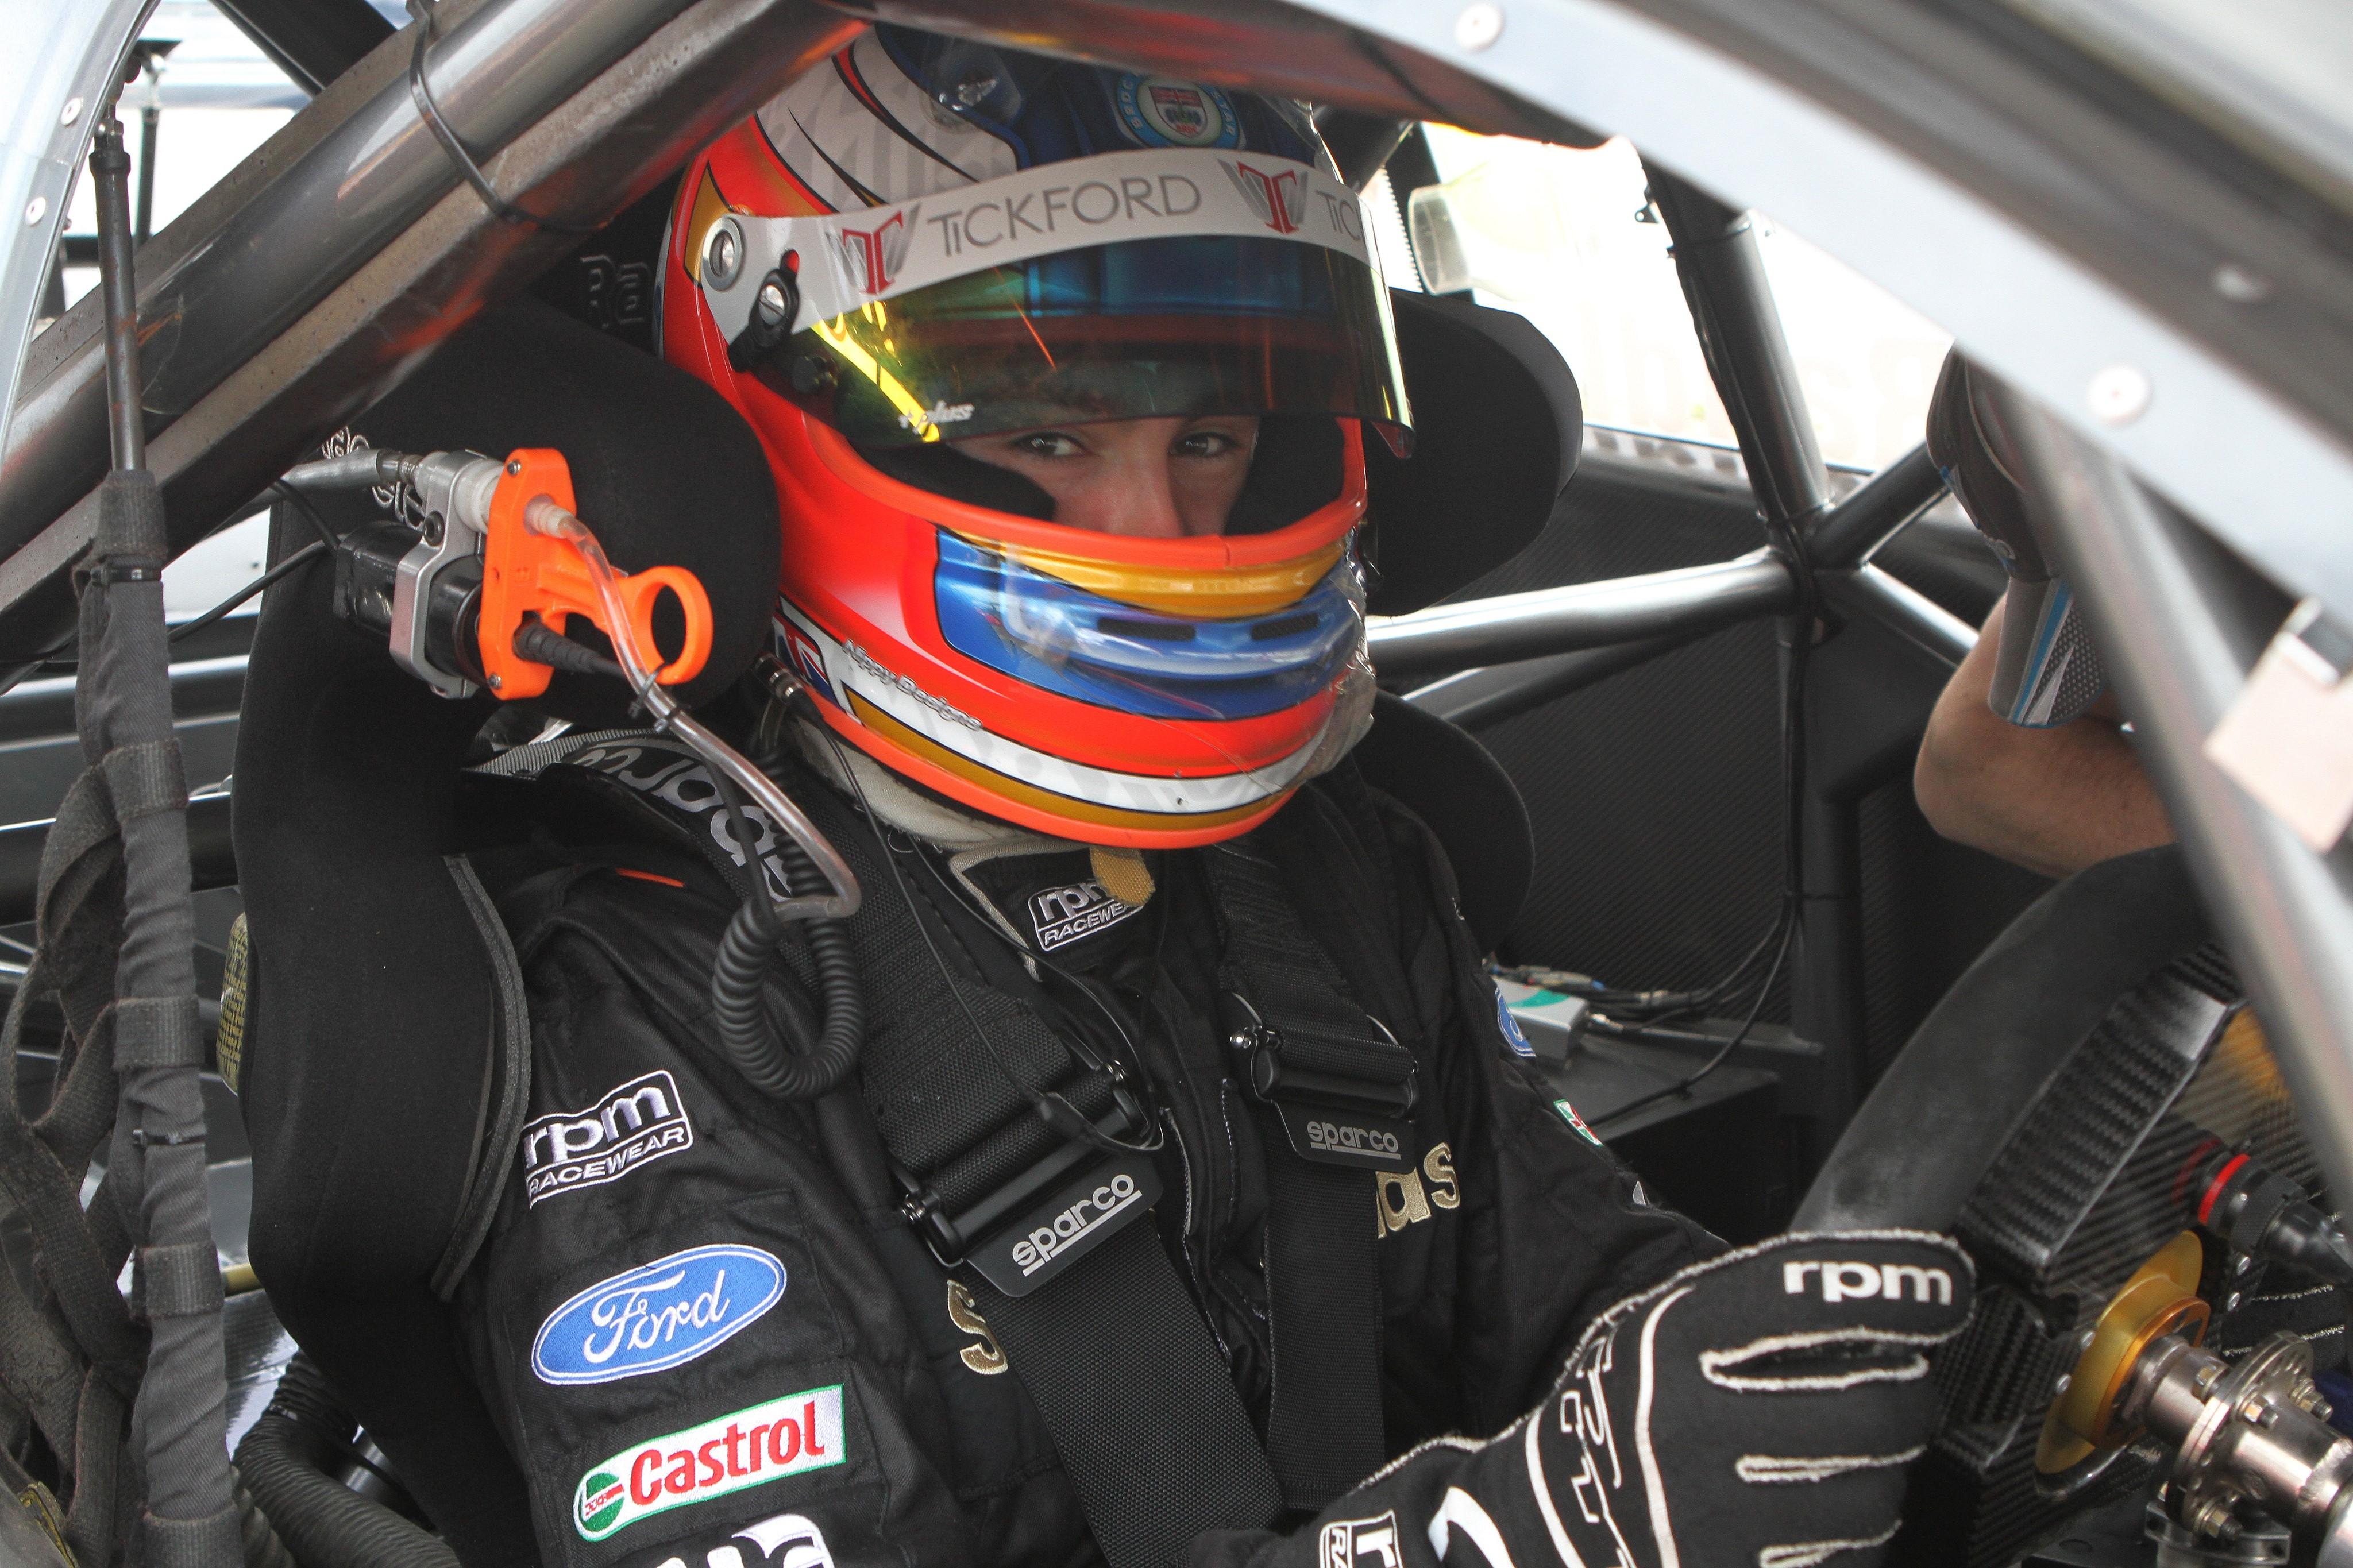 Dunlop Super2 - Round 3 - Barbagallo